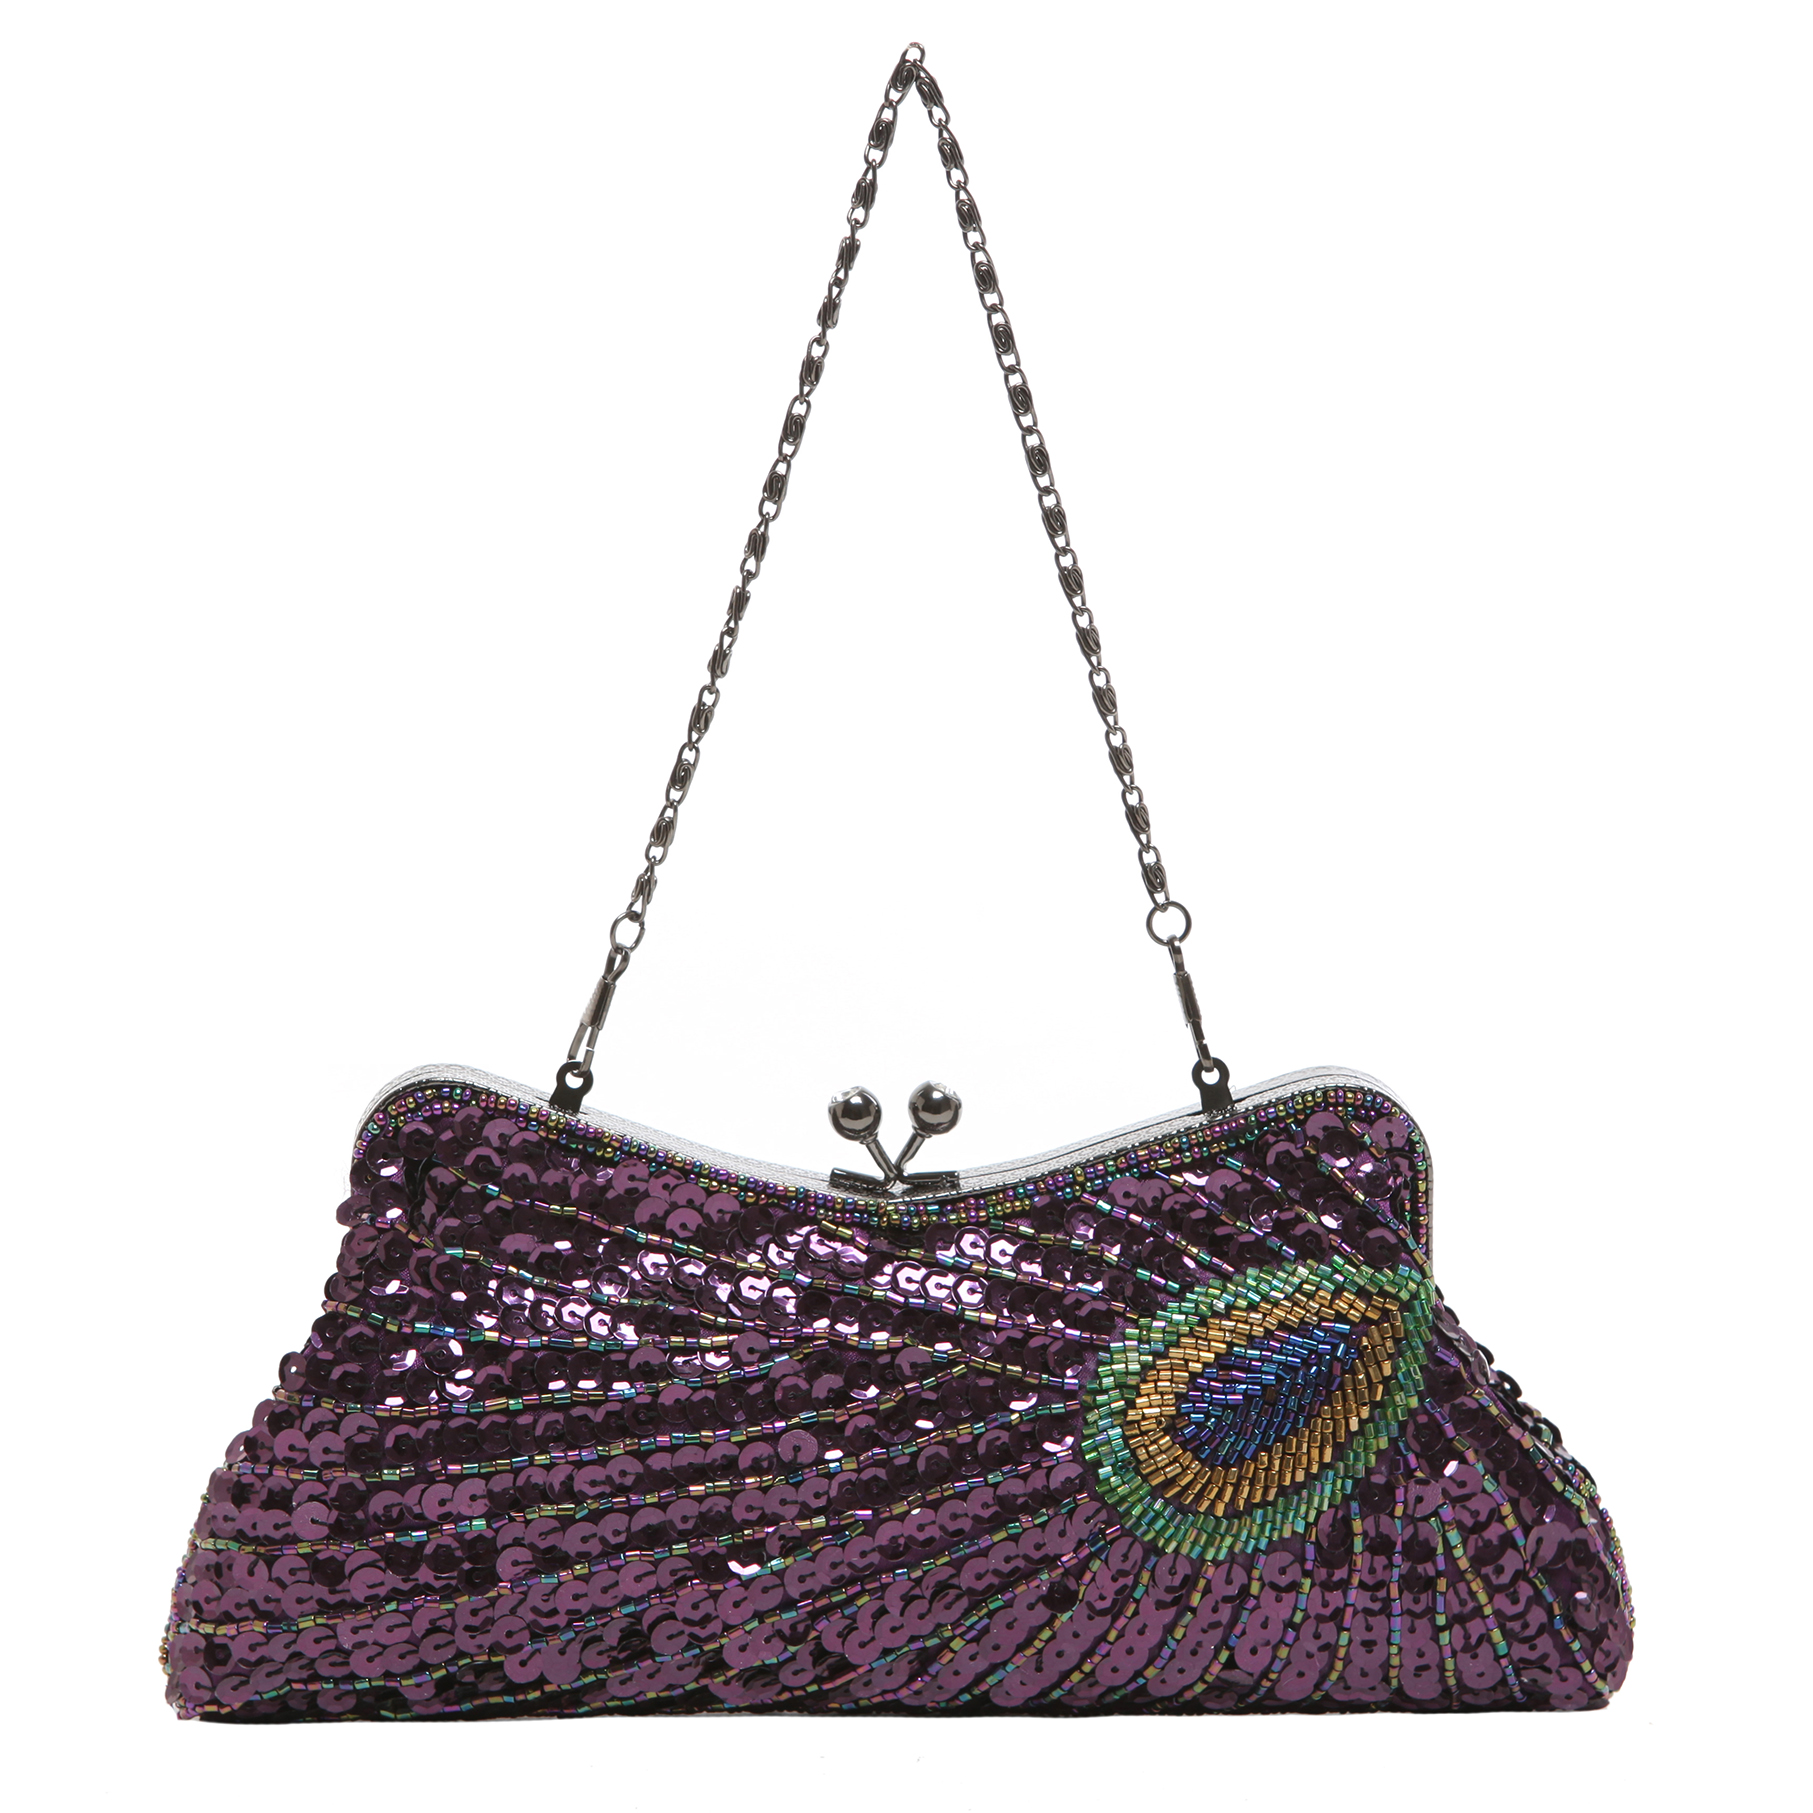 LAUREL Purple Sequined Evening Bag short strap